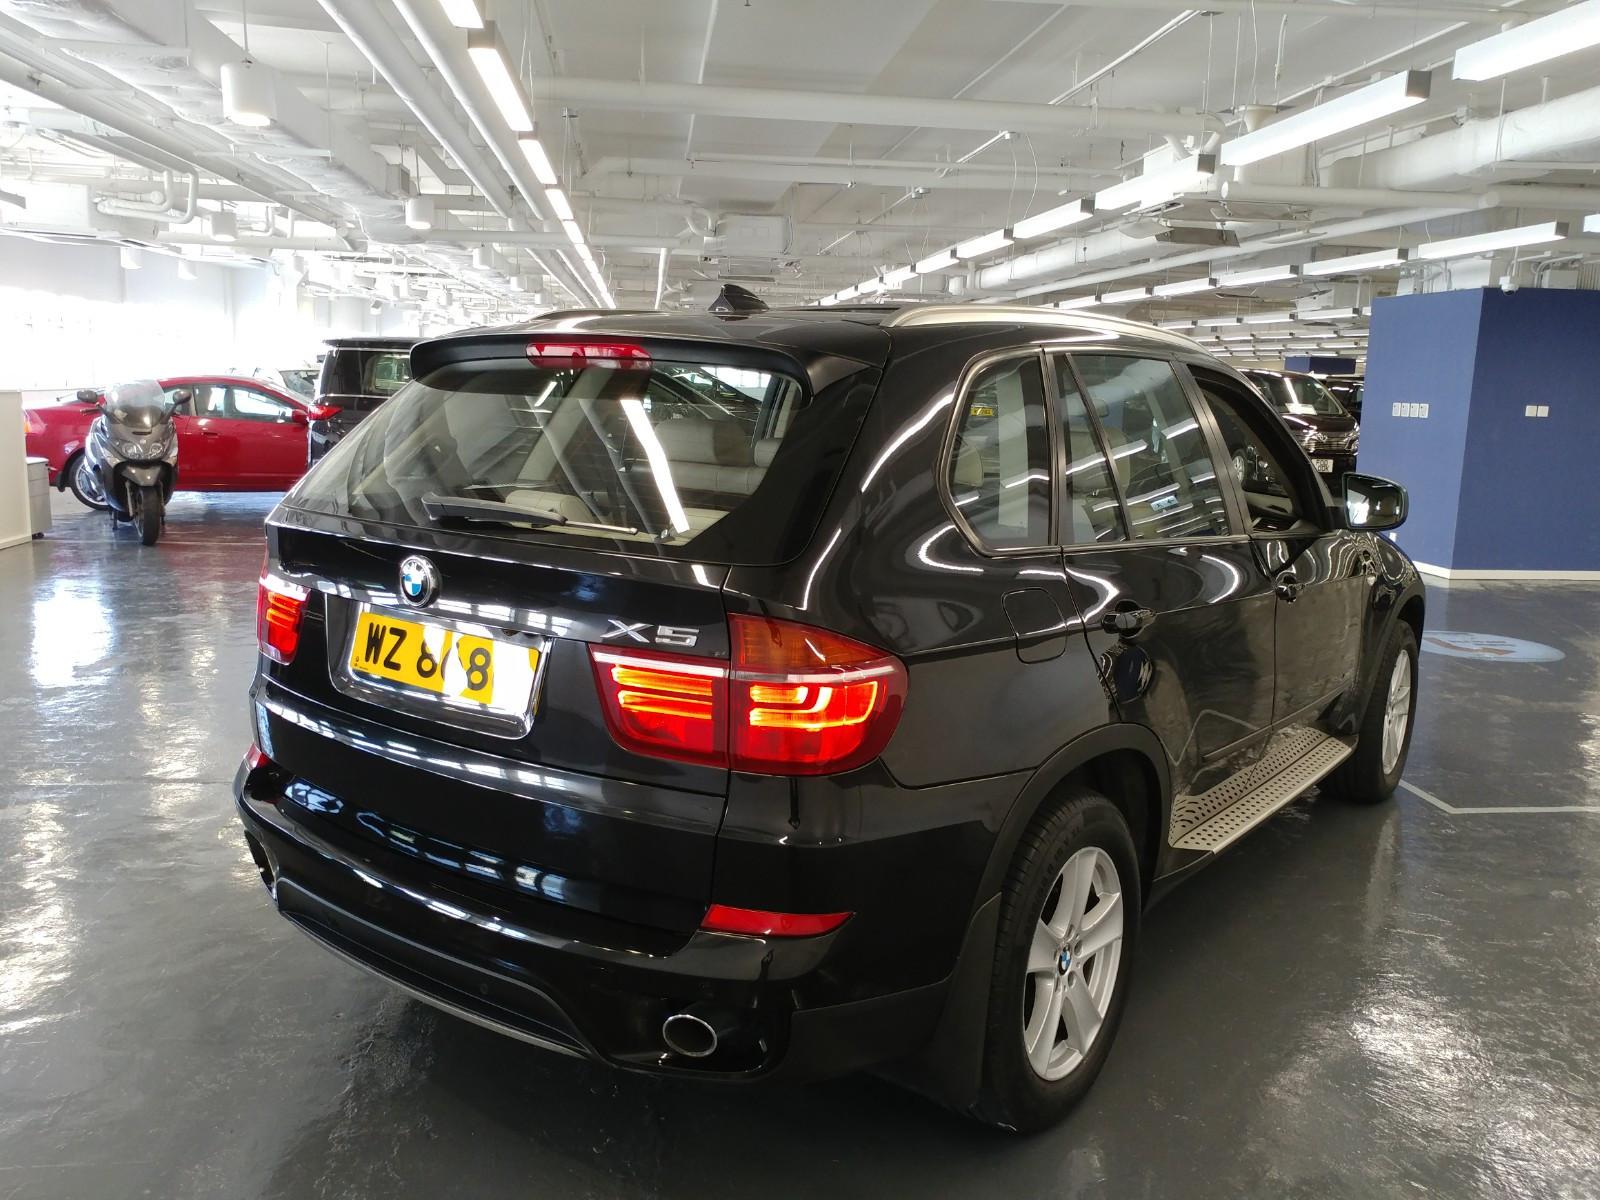 X5 xDrive 35i - 7座 TwinPowerTurbo - Image 7